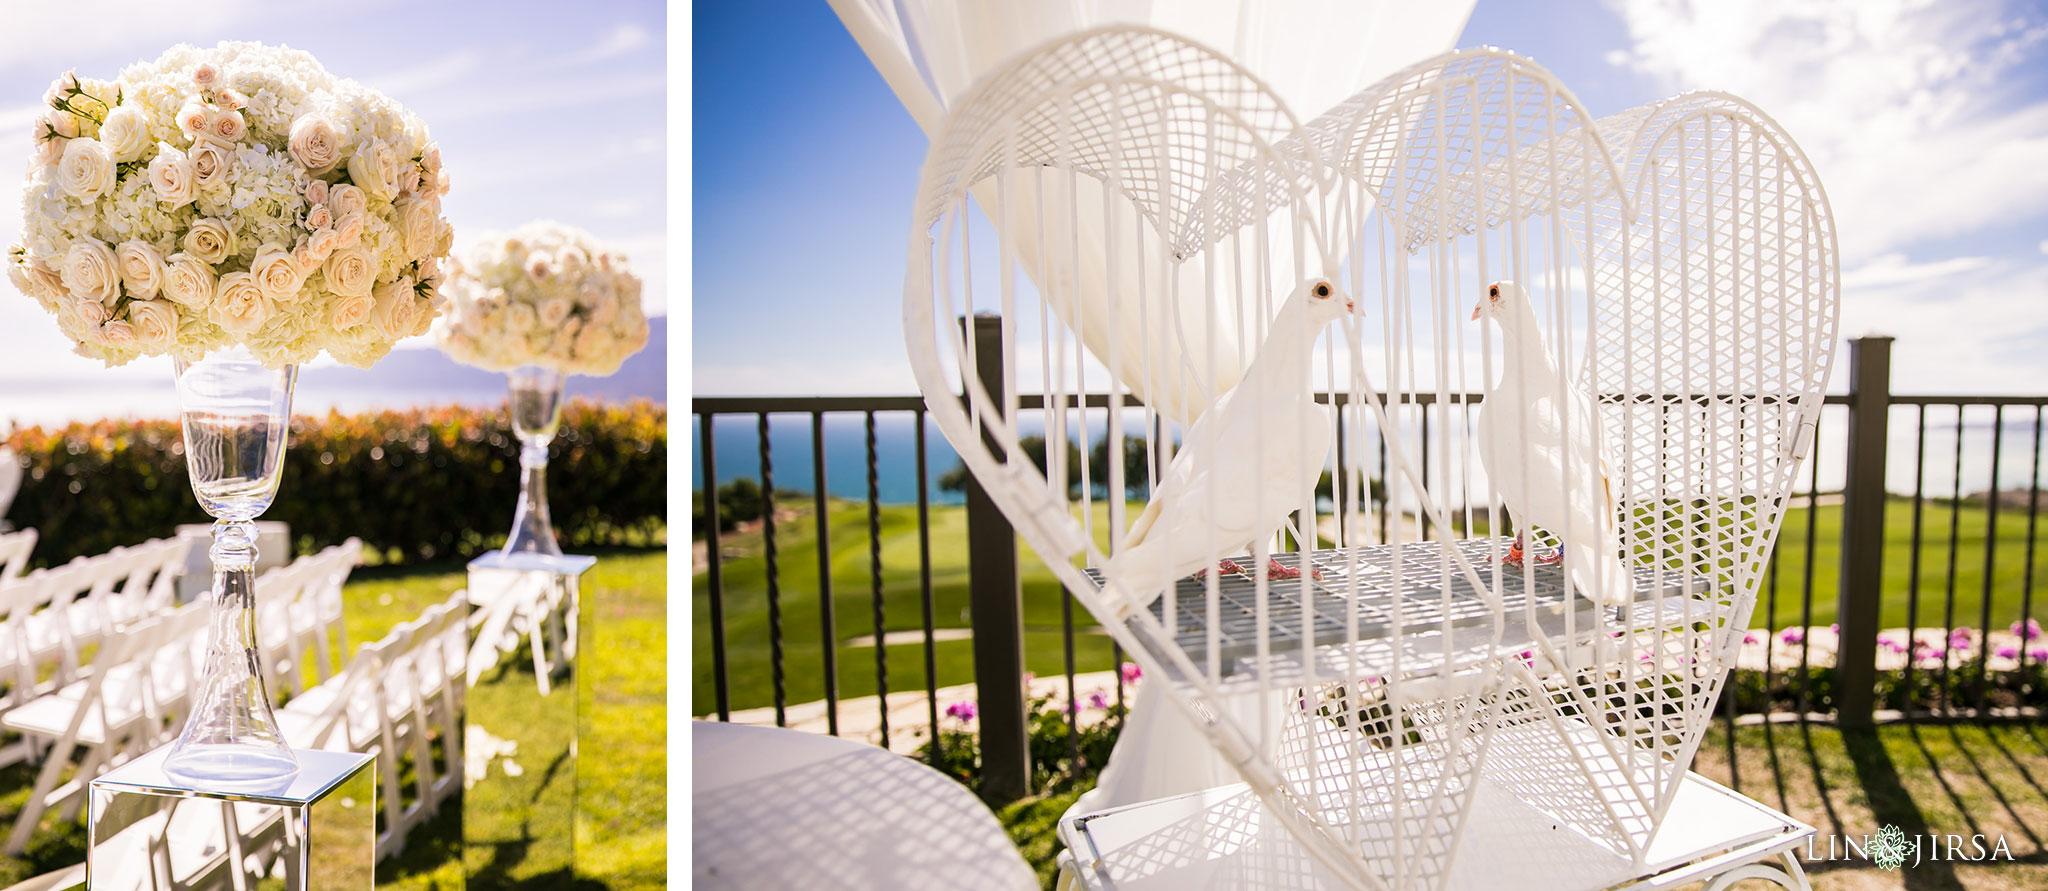 12 trump national golf club palos verdes wedding ceremony photography